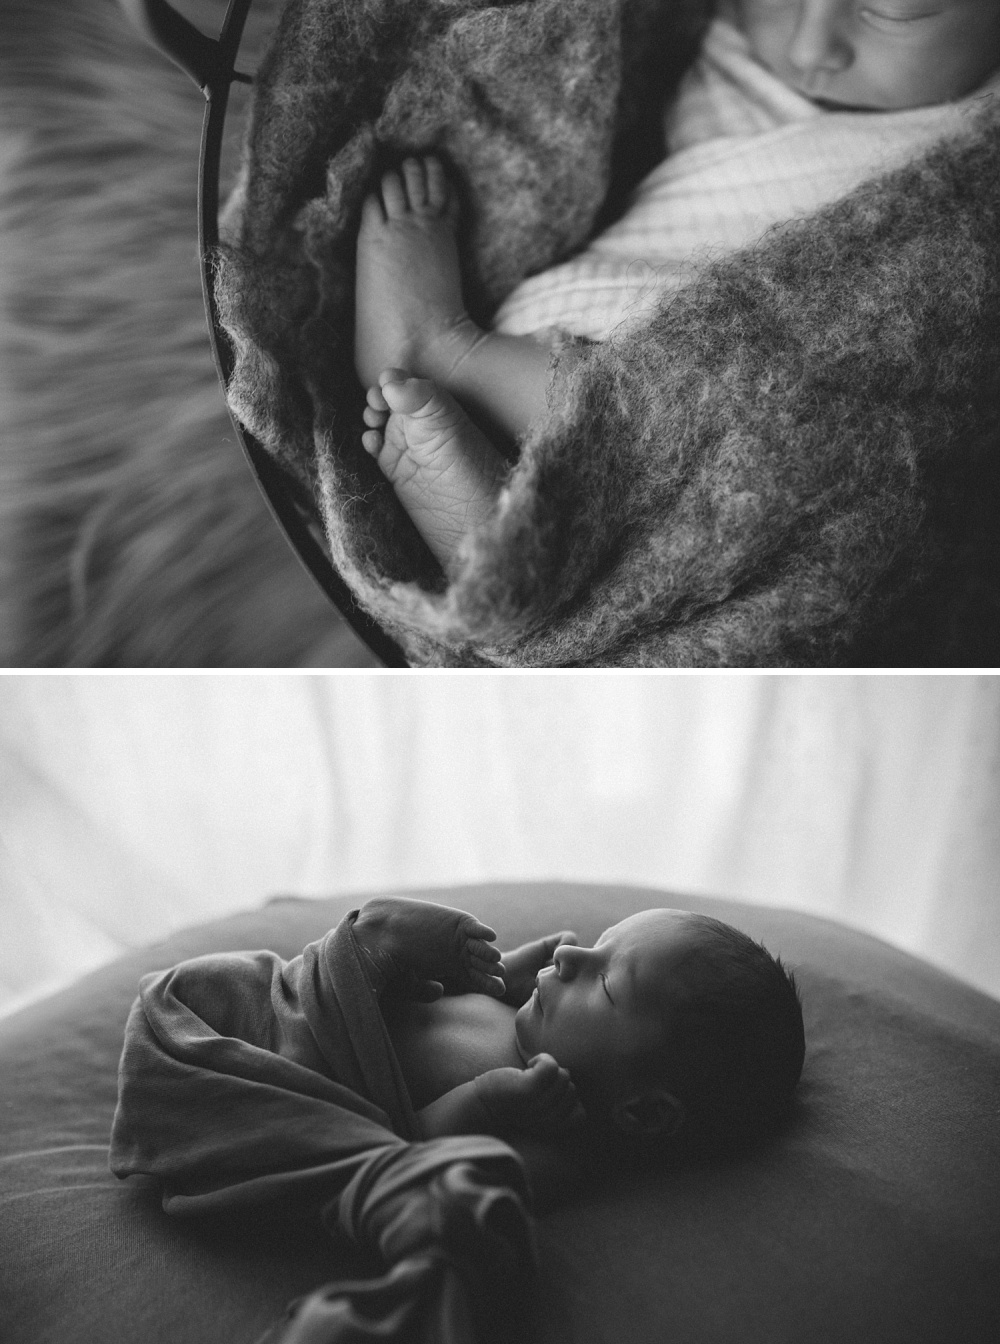 Neugeborenenfotoshooting_2020_Photoliebe_Bremen (15 von 29)_Neugeborenenshooting